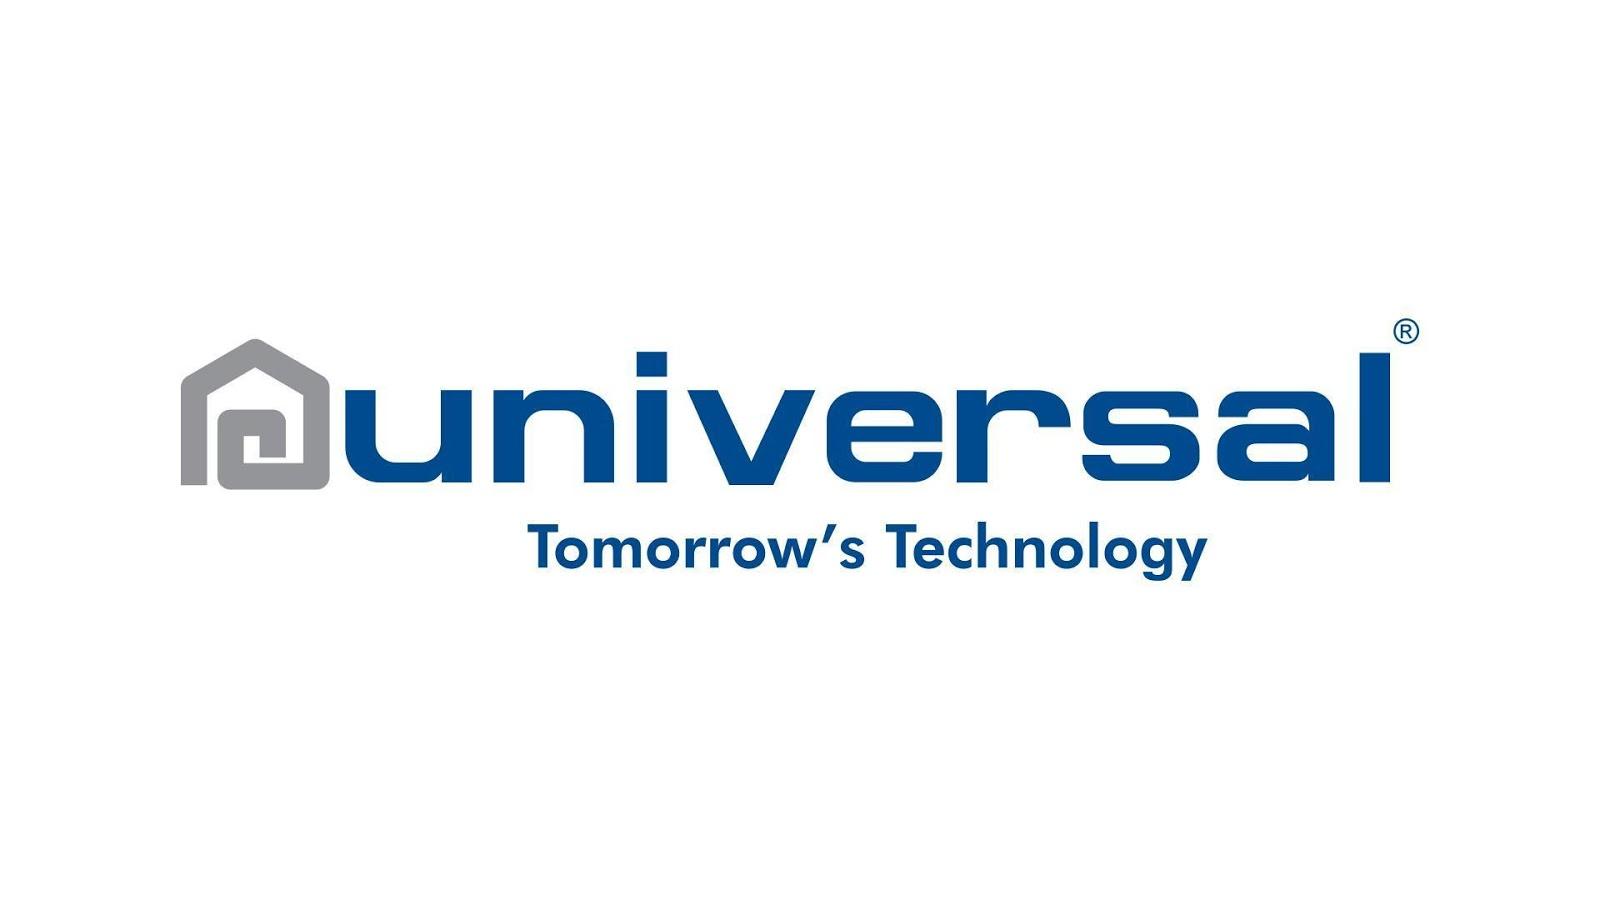 وظائف شركة universal Group - Egy Rec توظيف